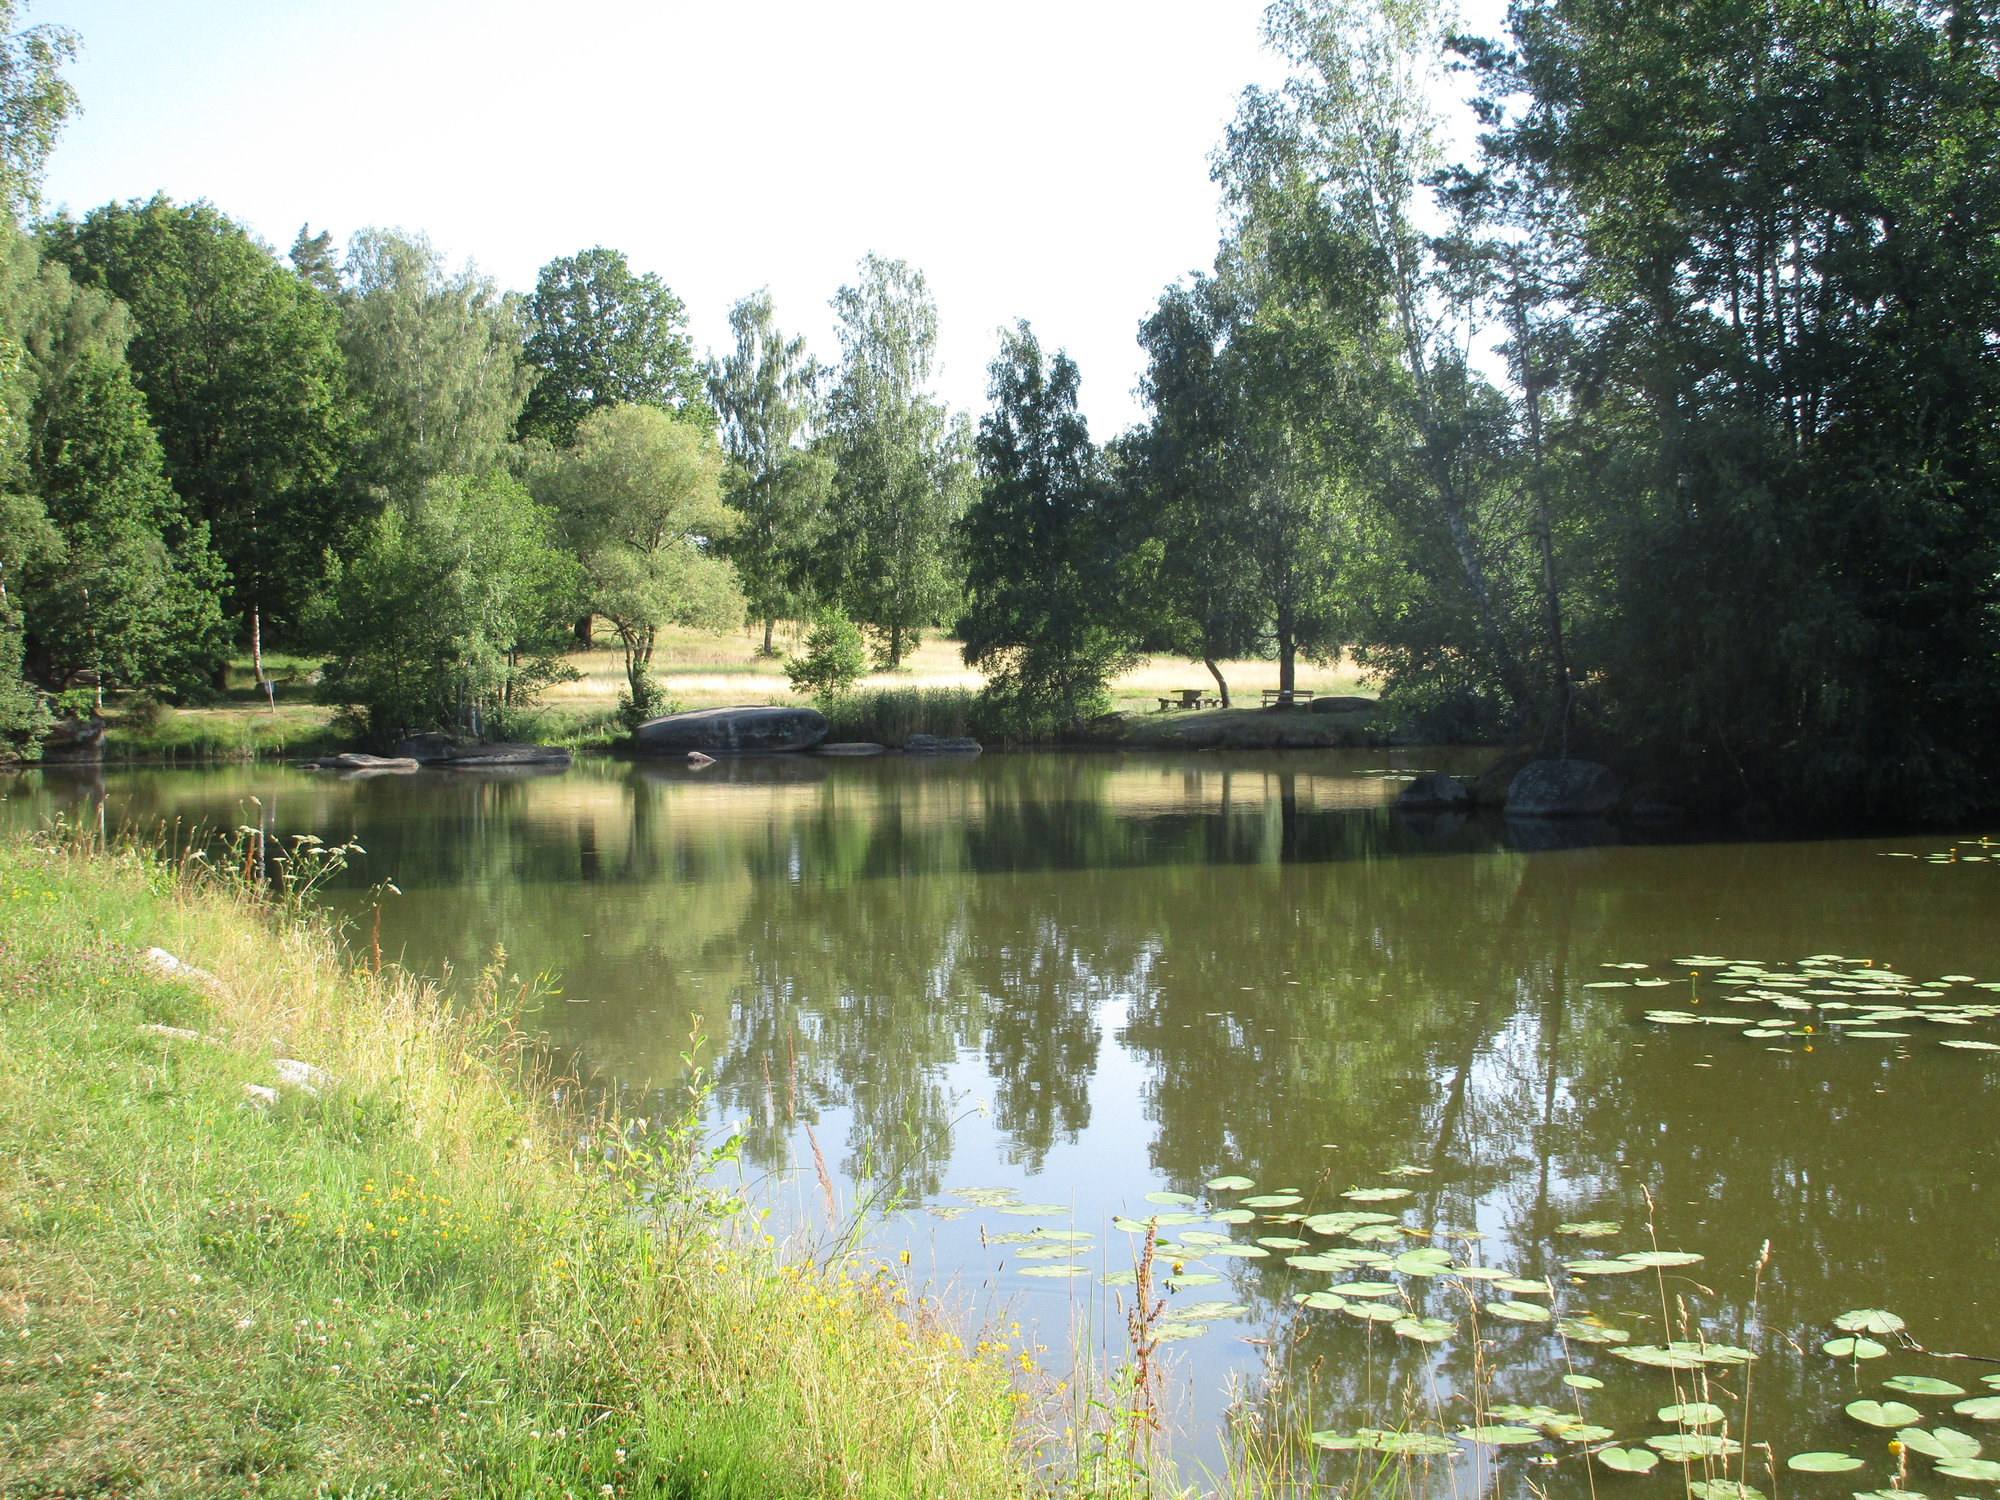 rybník Blockheide Teich